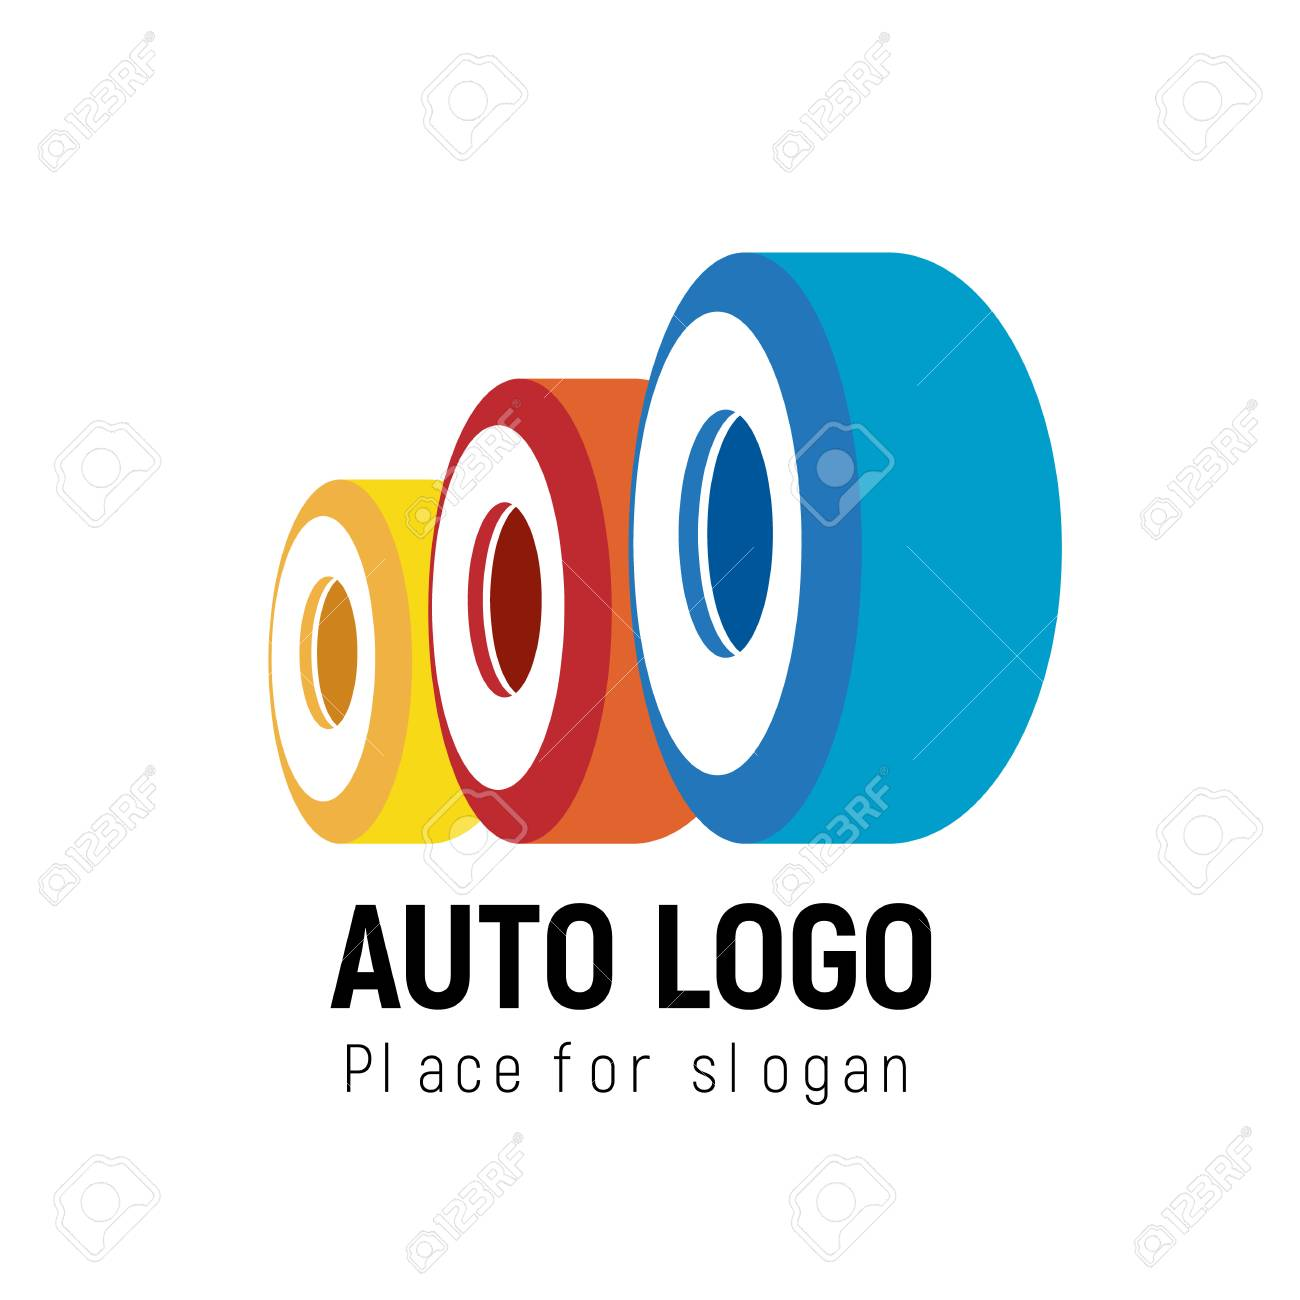 auto logo template logotype automobile shop workshop or repair rh 123rf com auto shop logo design auto body shop logo design